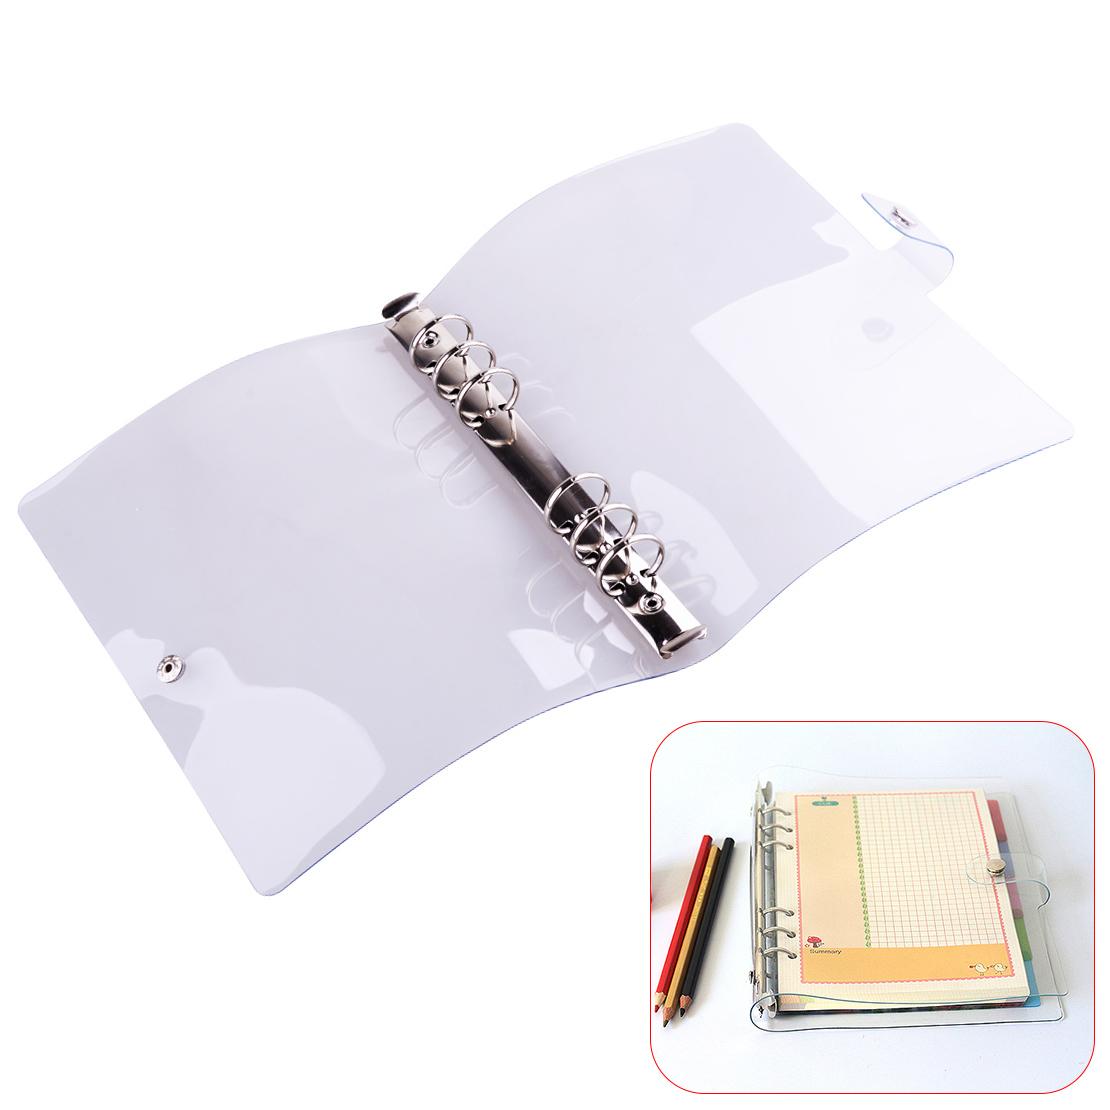 A5 Lose Blätter Ordner Ringbuch Spiral Loose Leaf Ring Binder Notizbuch Tagebuch